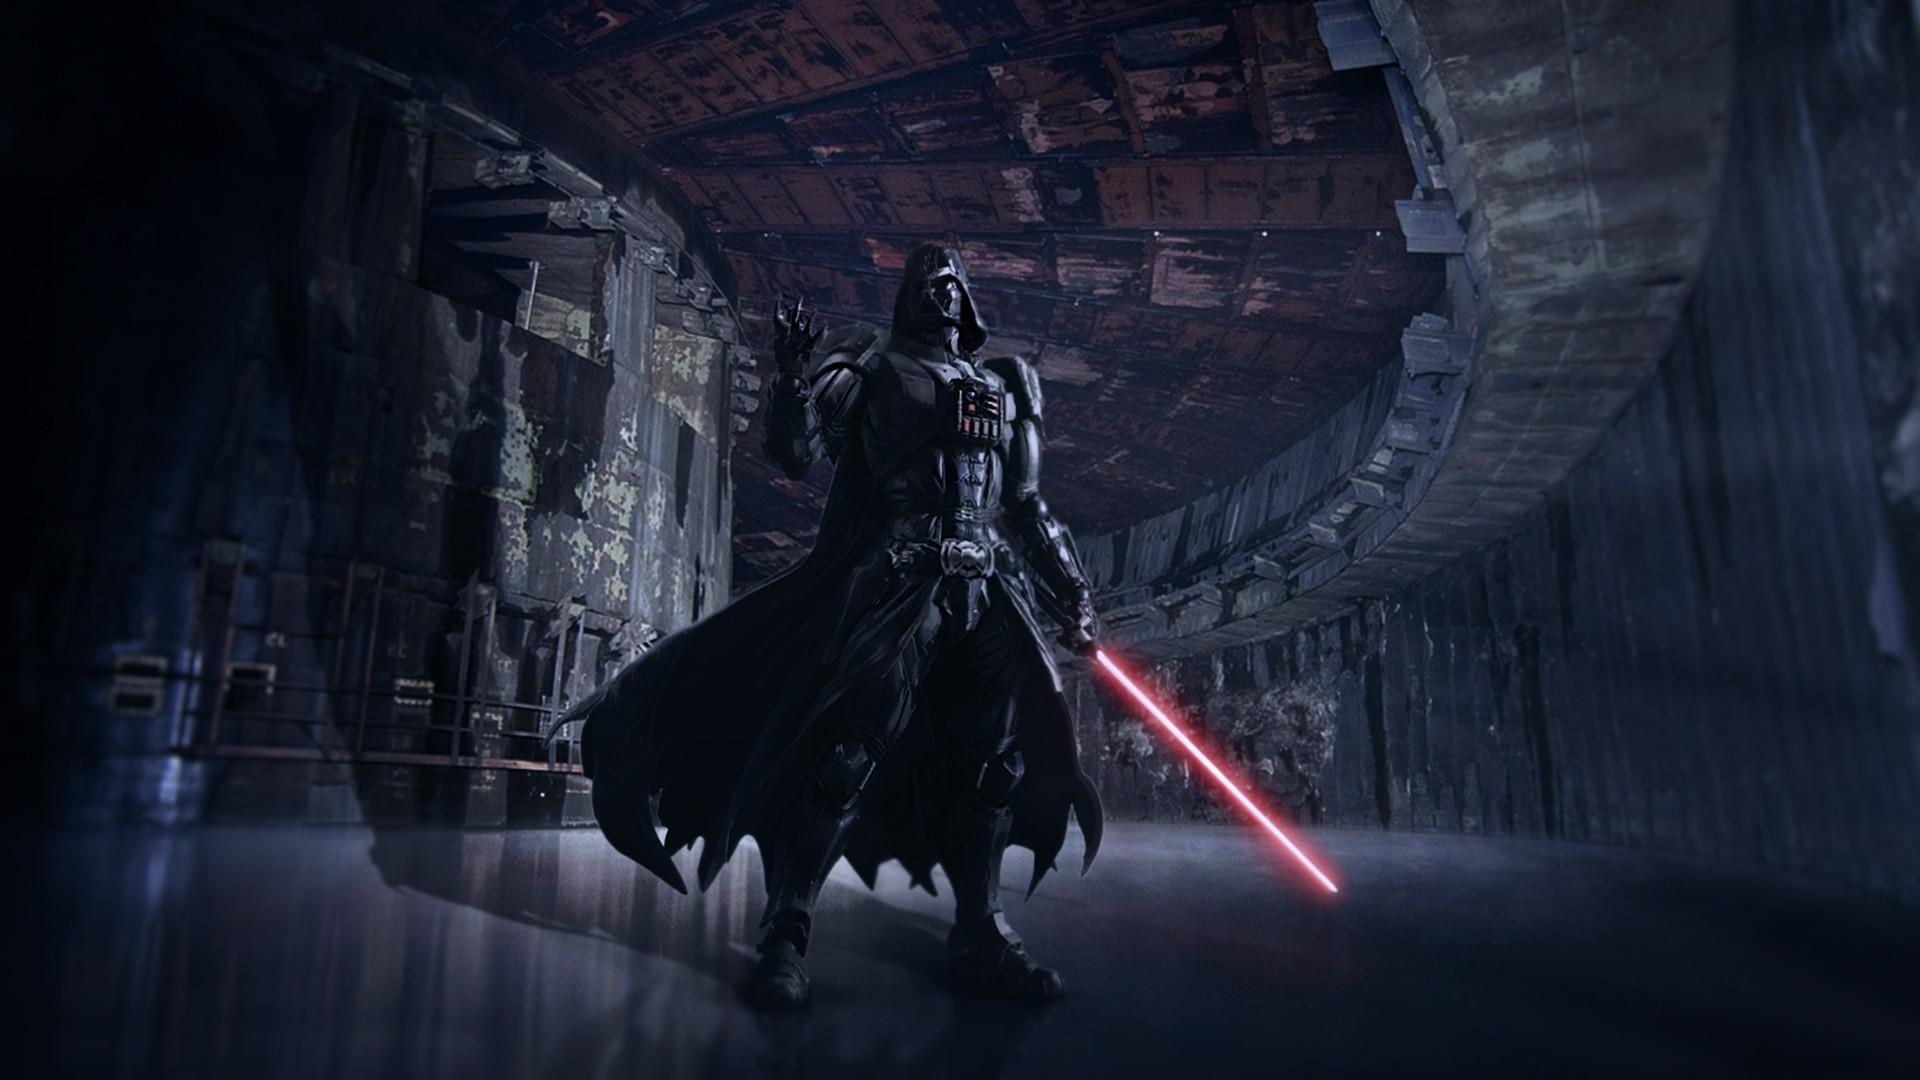 Darth Vader, Star Wars, Adobe Photoshop. artwork, Star Wars, Star Wars:  Episode VII The Force Awakens, X wing Wallpaper HD